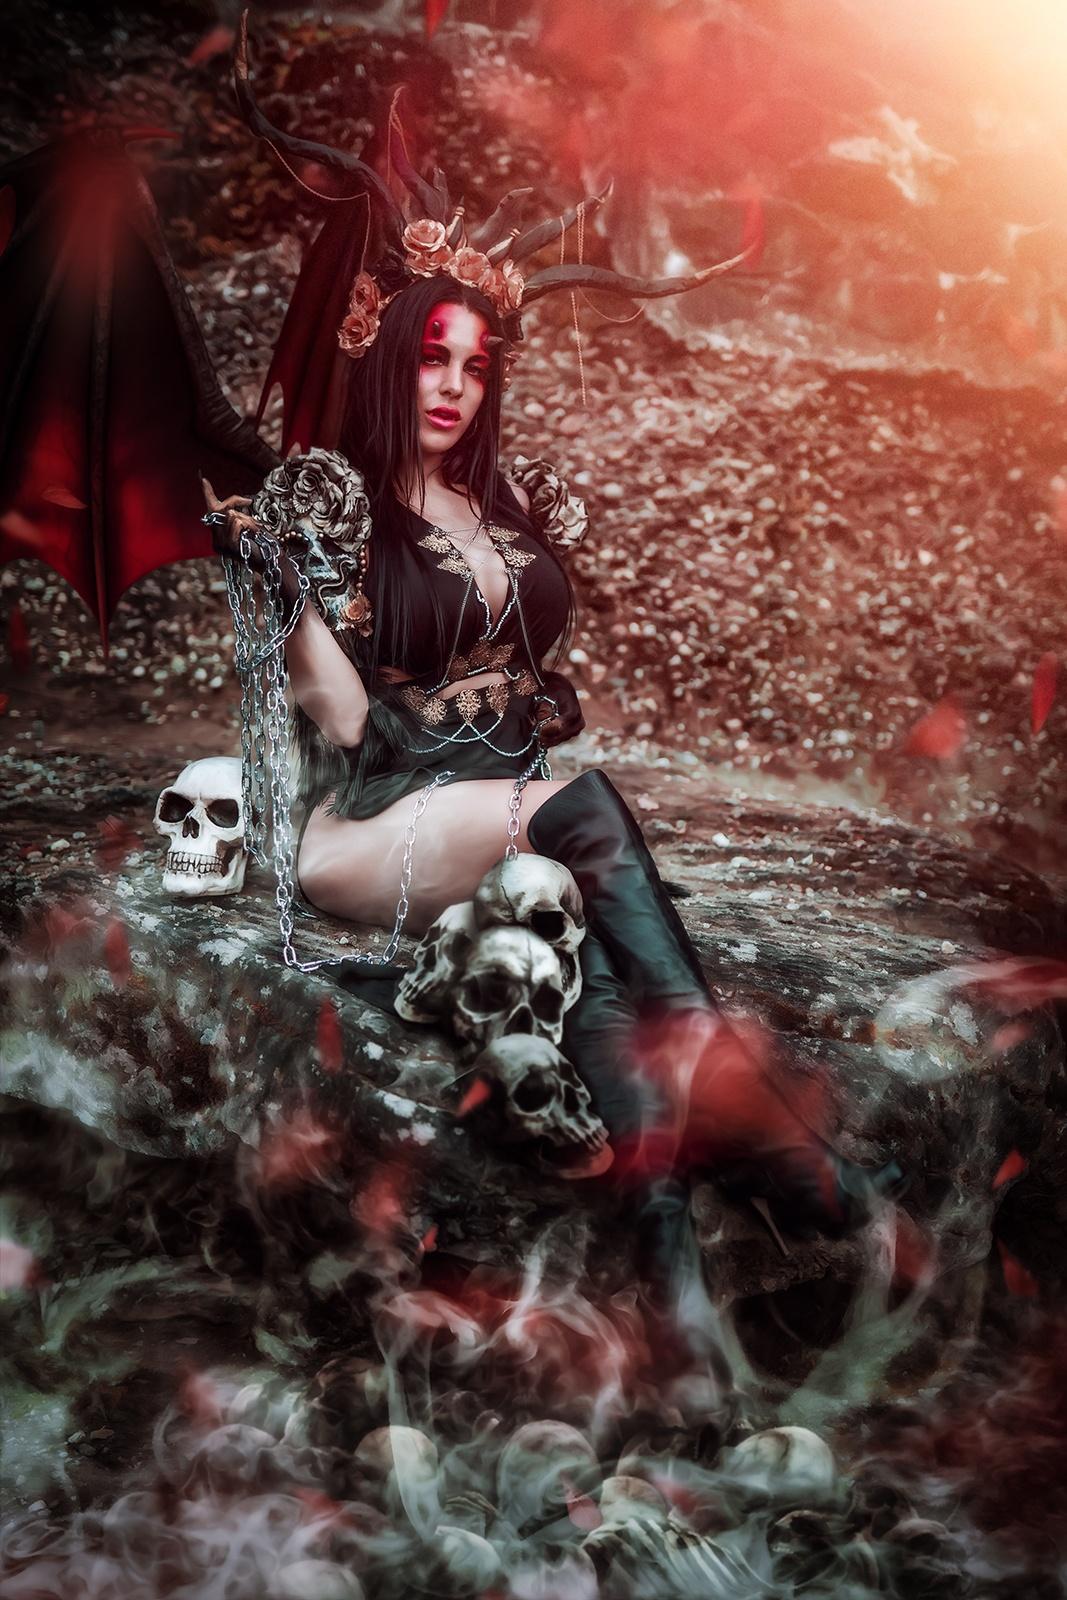 Succubus-Vampir-Fantasy-Fotoshooting-Schweiz-Halloween